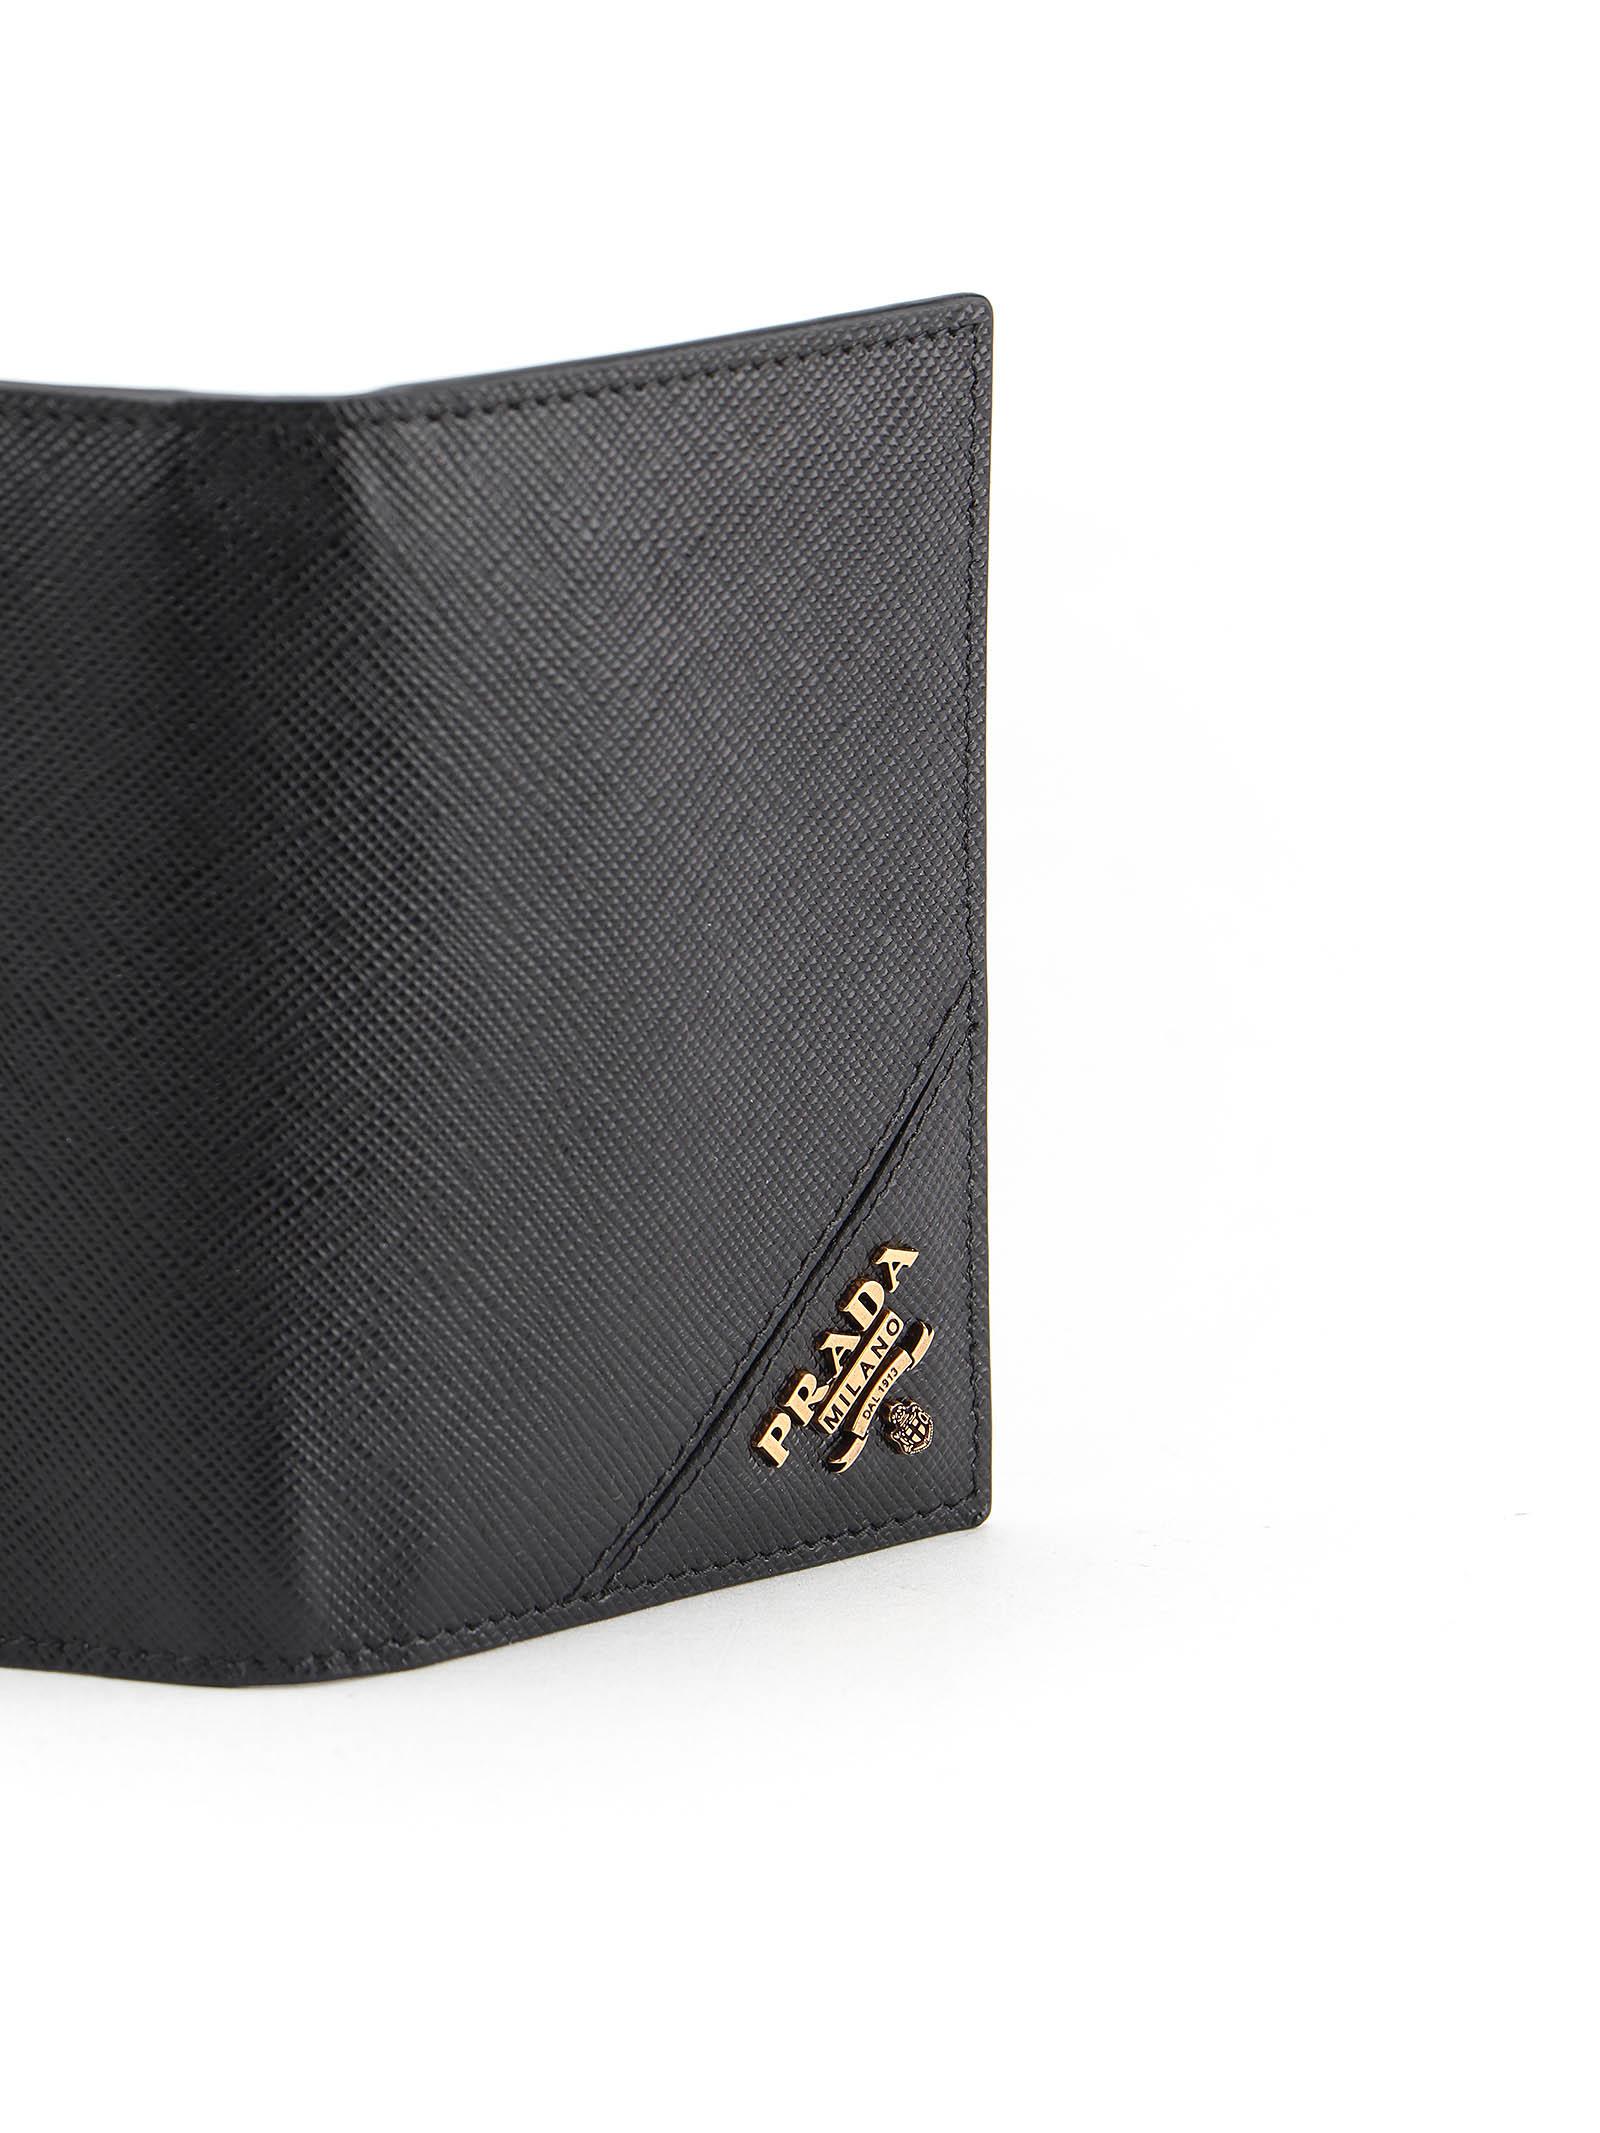 Immagine di Prada   Saffiano Leather Card Holder